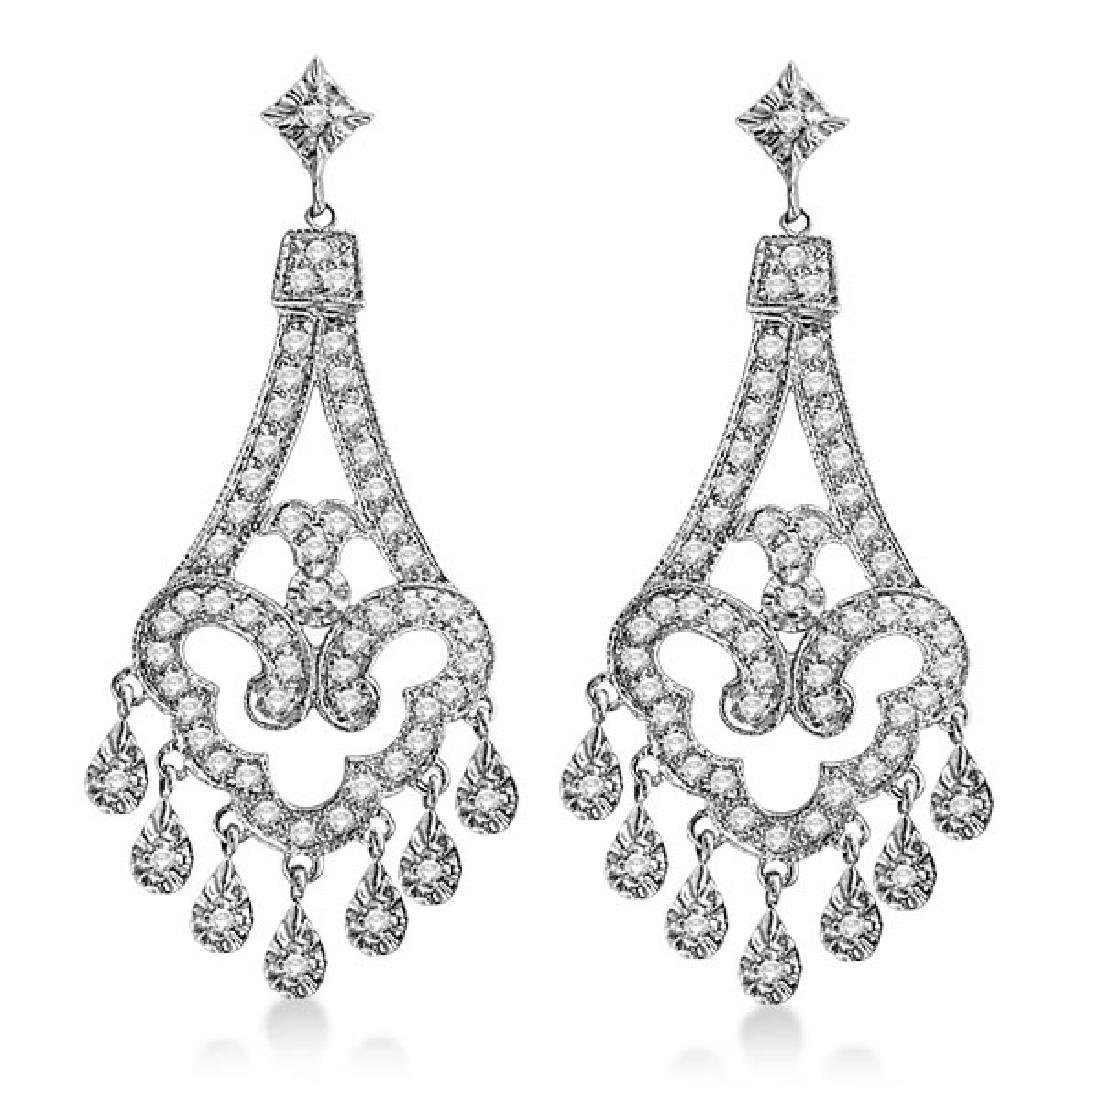 Dangling Chandelier Diamond Earrings 14K White Gold (1.